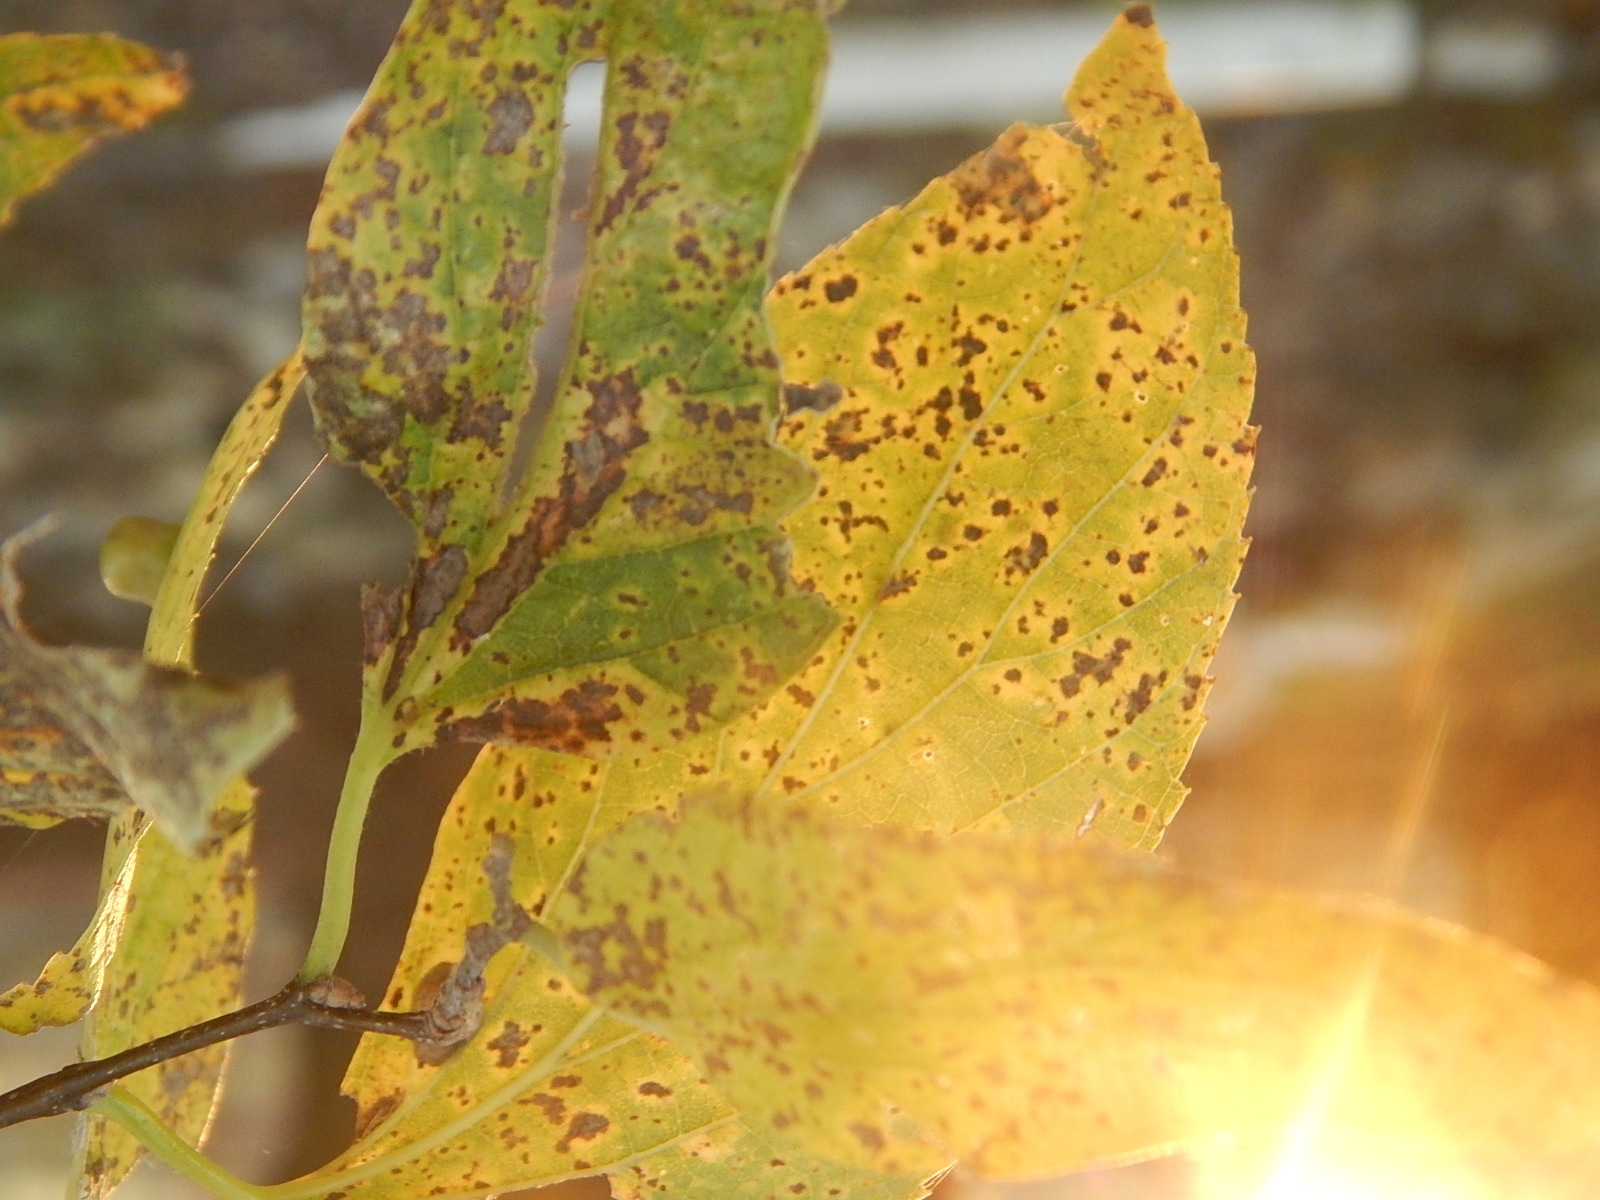 Sunset thru leaves by Marsha Furman